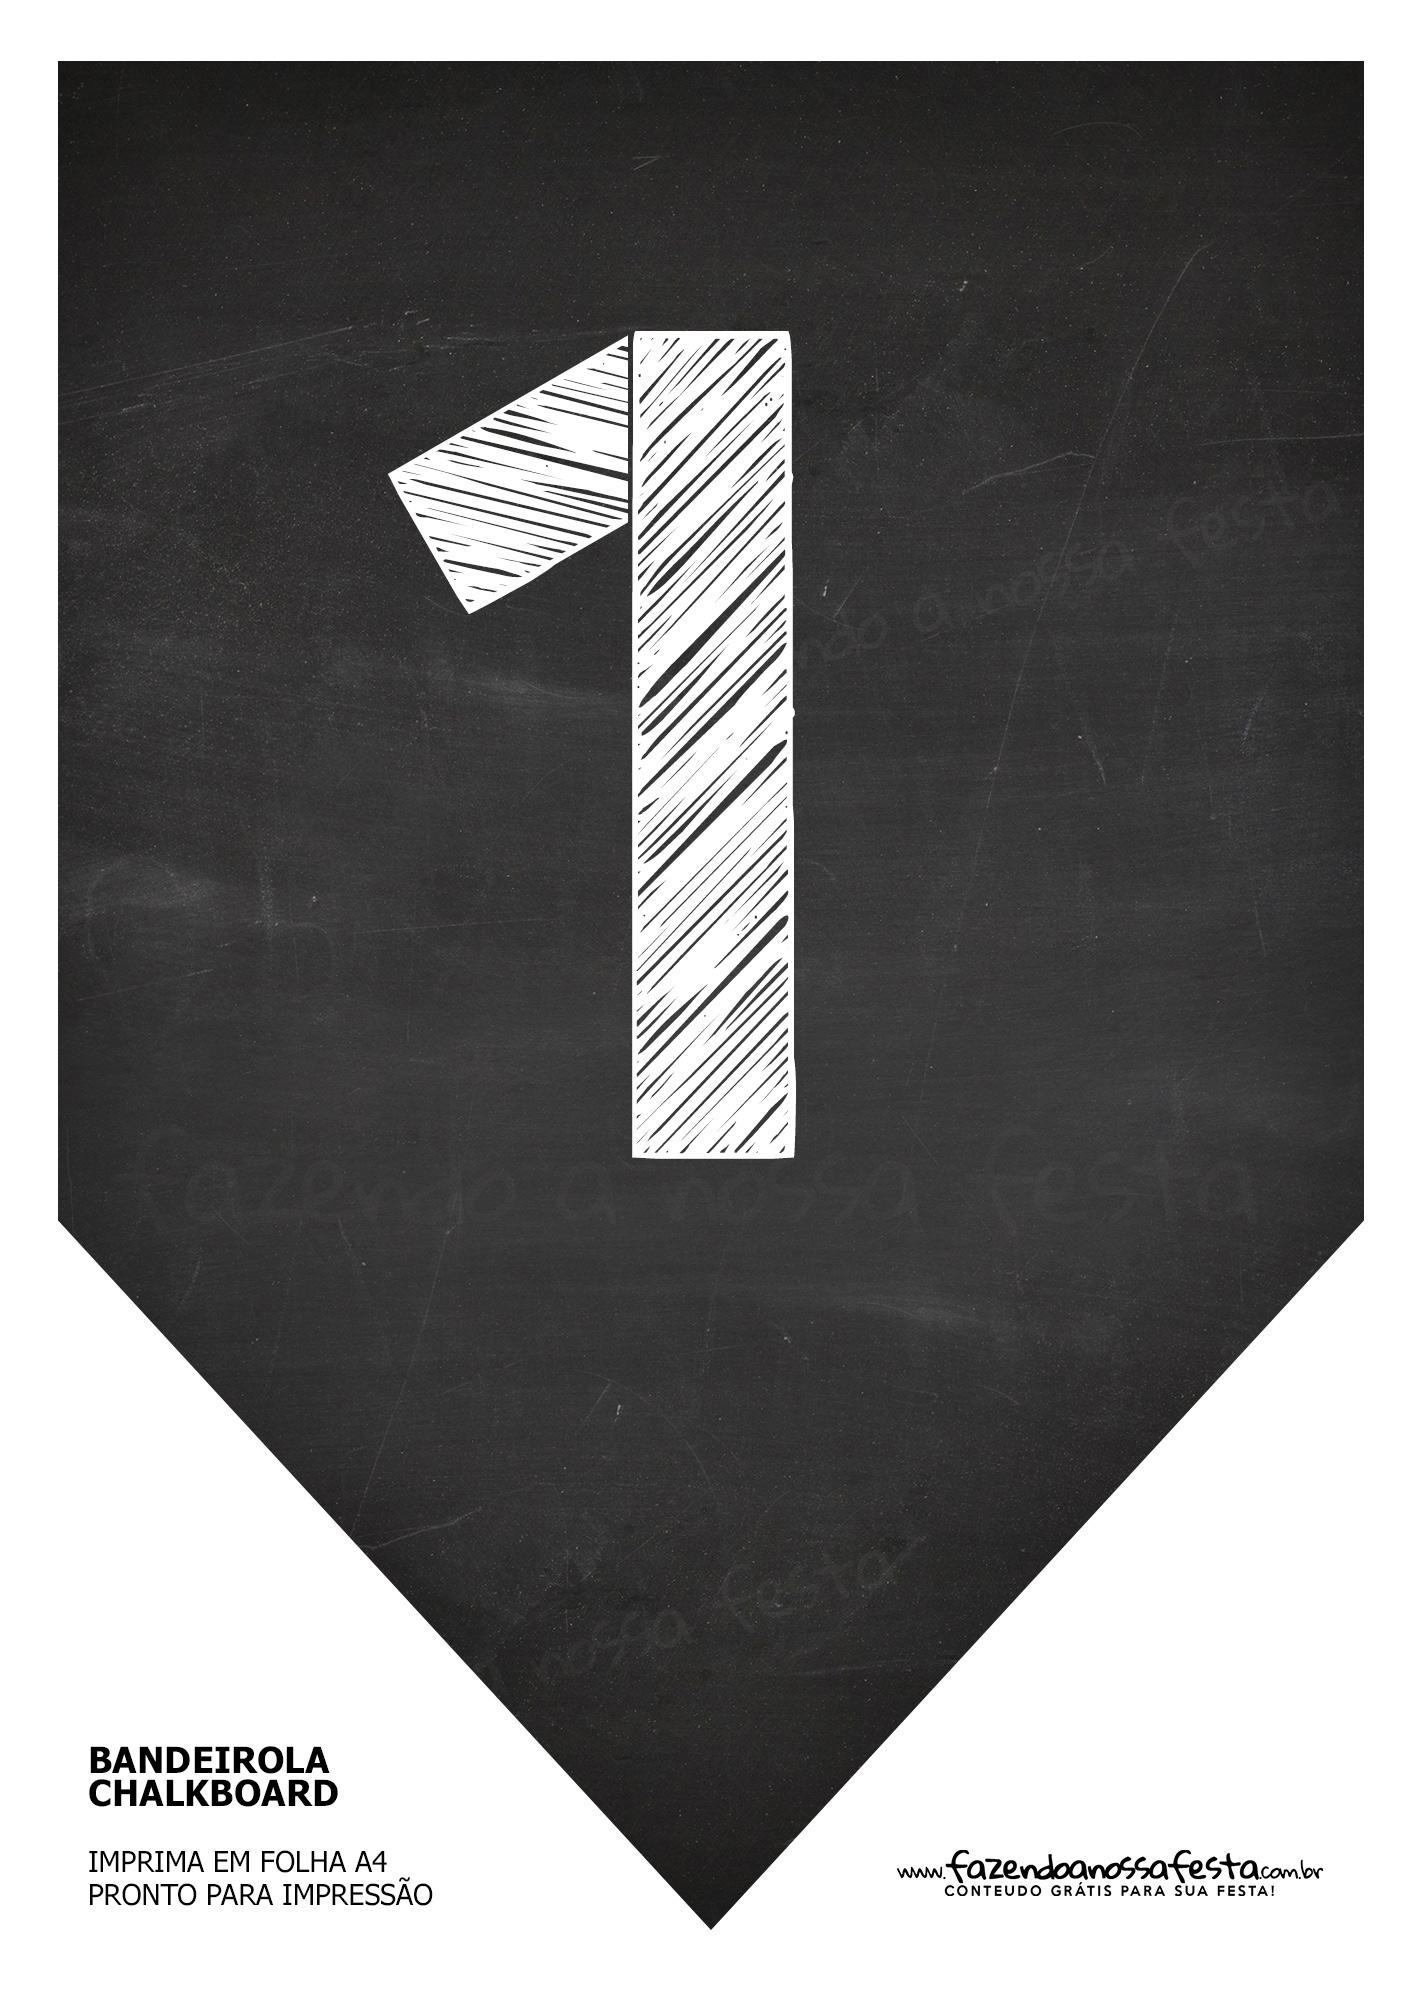 Bandeirinha Chalkboard 1